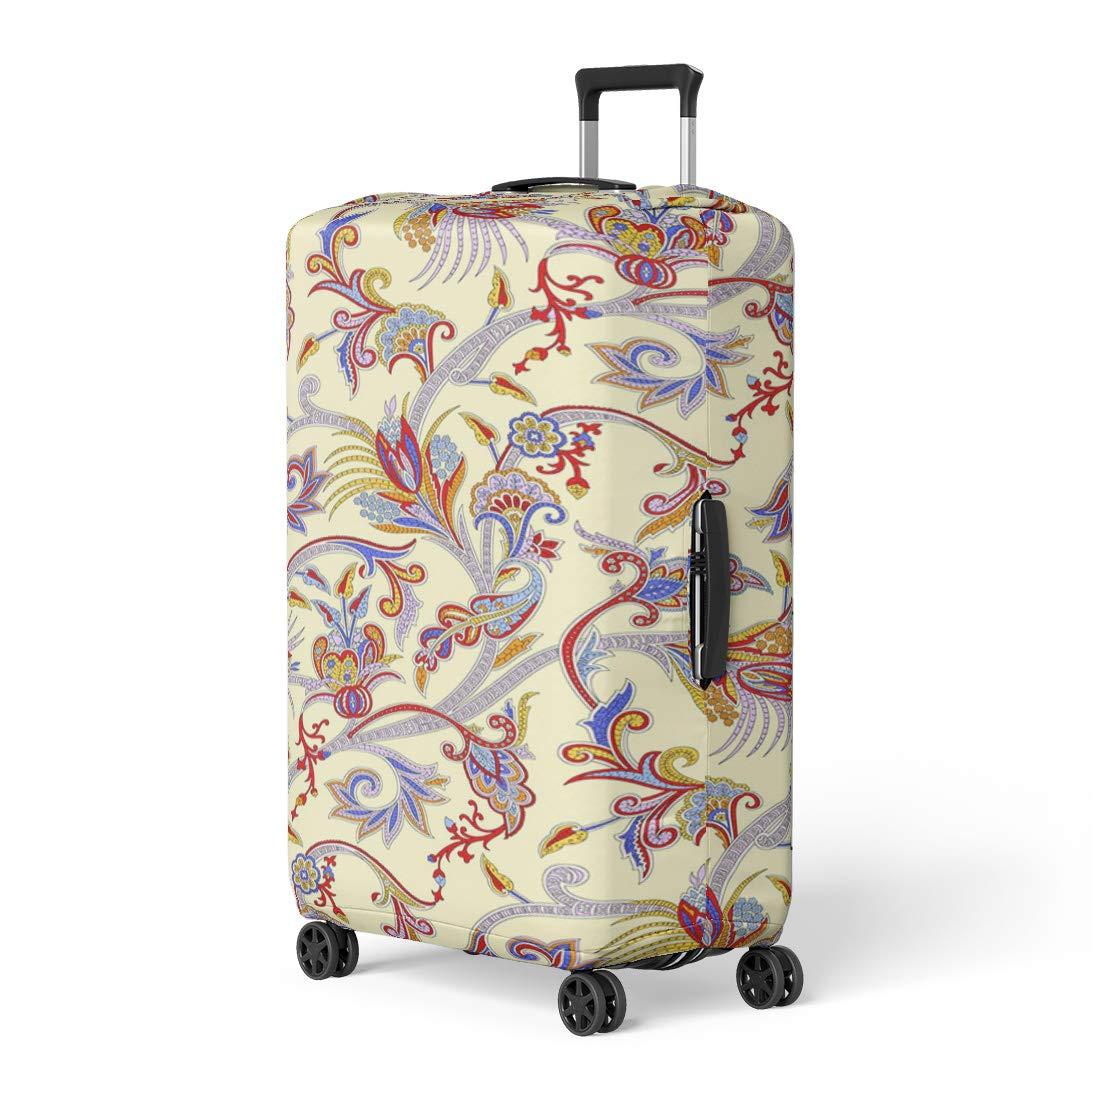 b0f4819f91ec Amazon.com: Pinbeam Luggage Cover Blue Colorful Mini Marshmallows ...